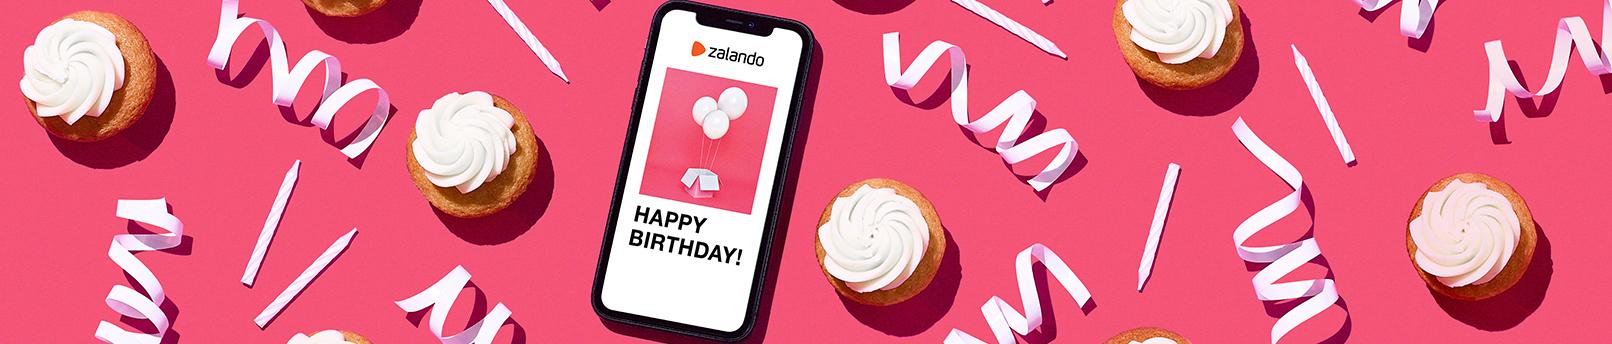 Zalando Gift Cards - A never-fail birthday present